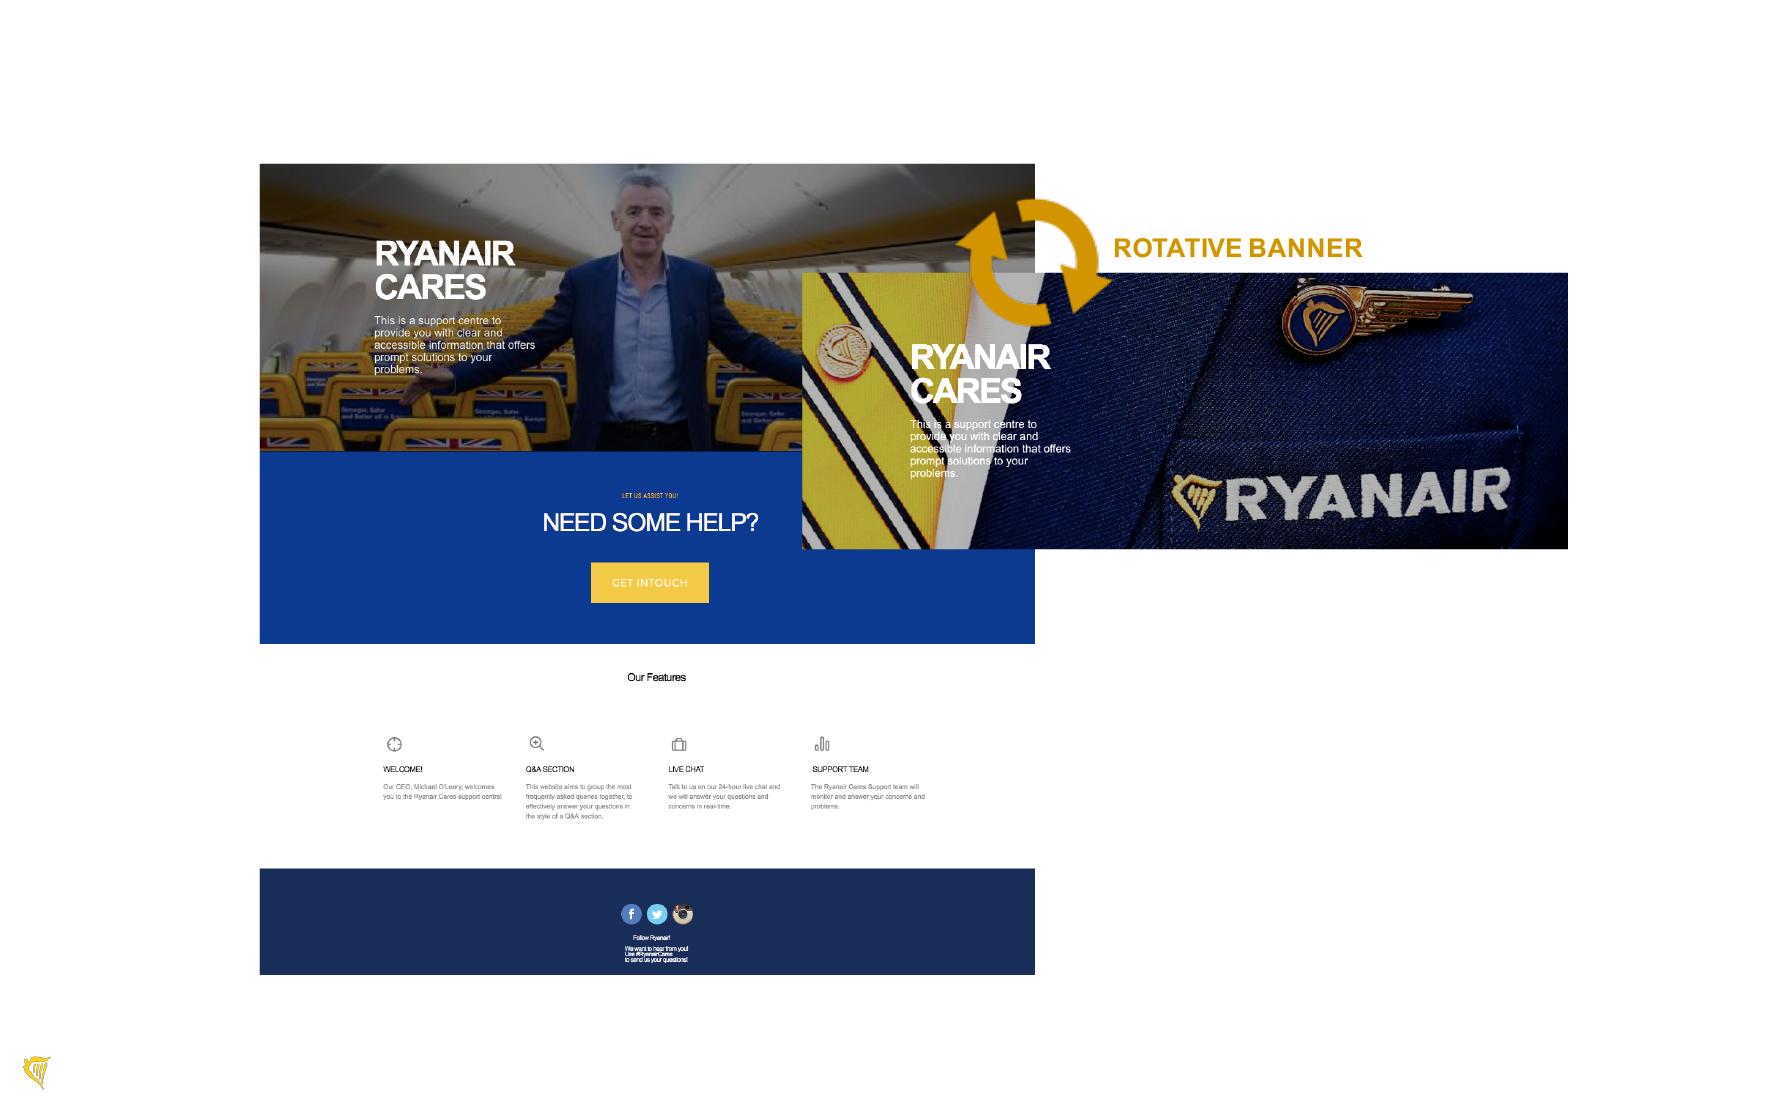 #RyanairCares Page15.png